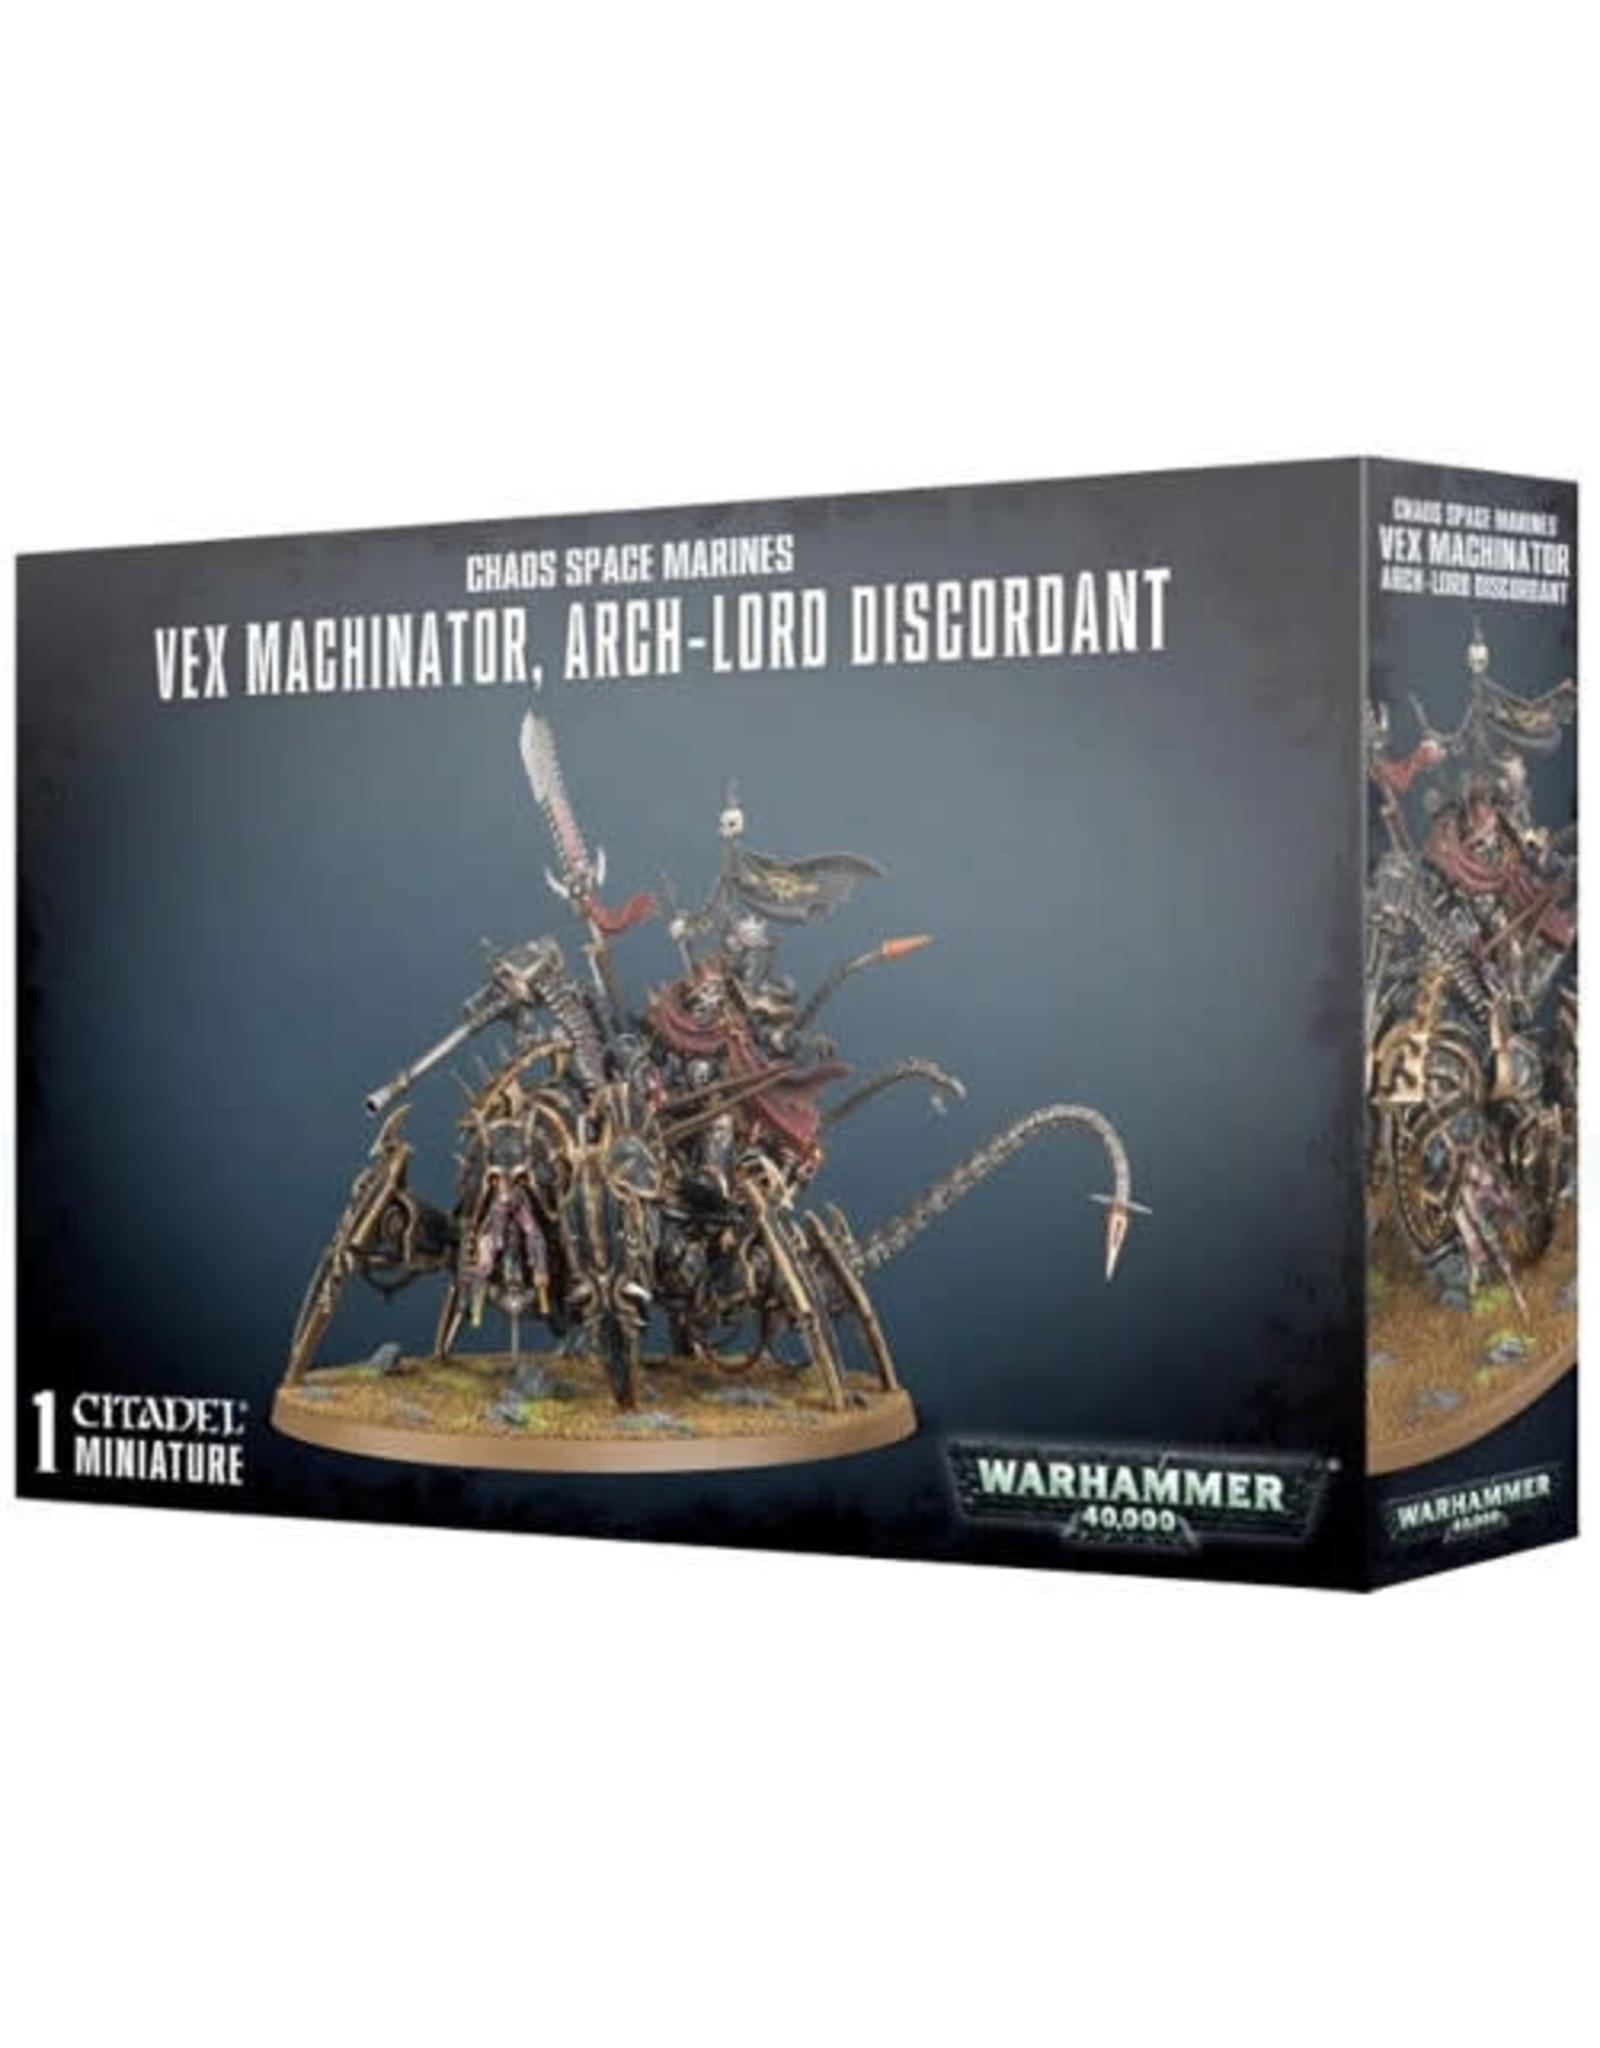 Games Workshop Chaos Space Marine Vex Machinator Arch Lord Discordant(40K)